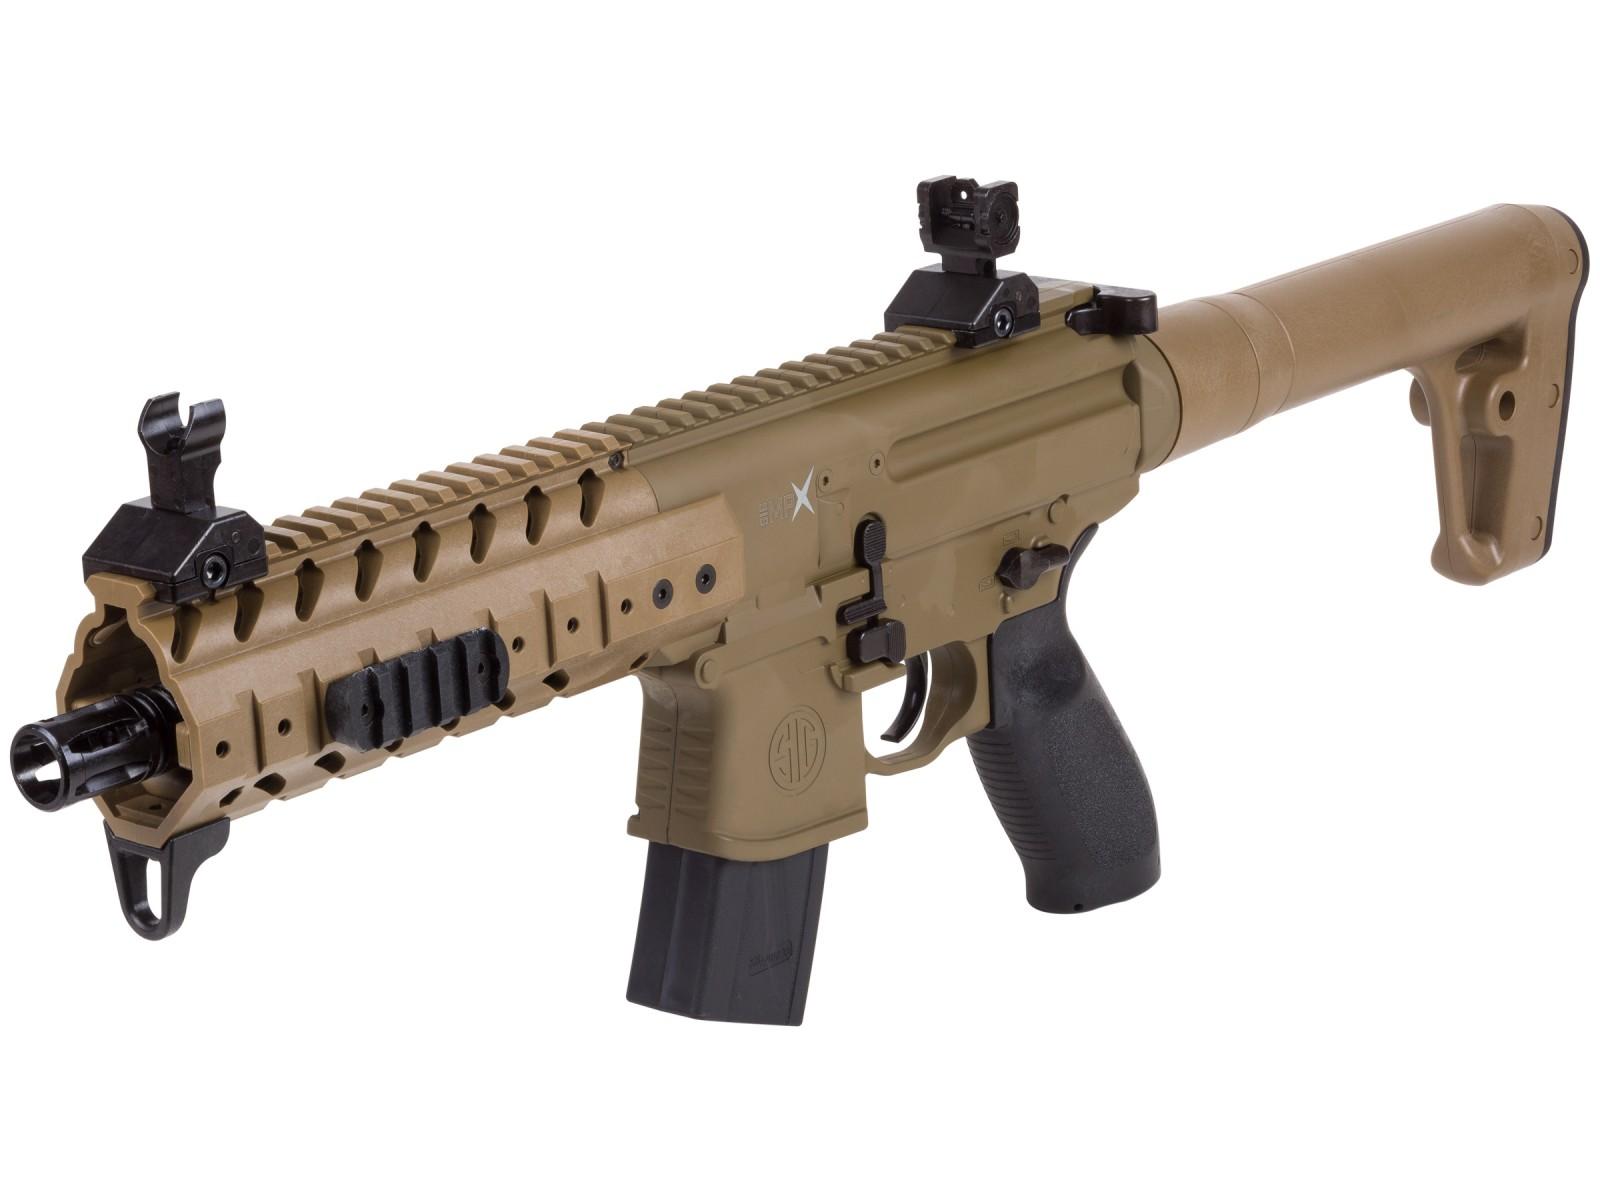 SIG Sauer MPX CO2 Pellet Rifle, Flat Dark Earth